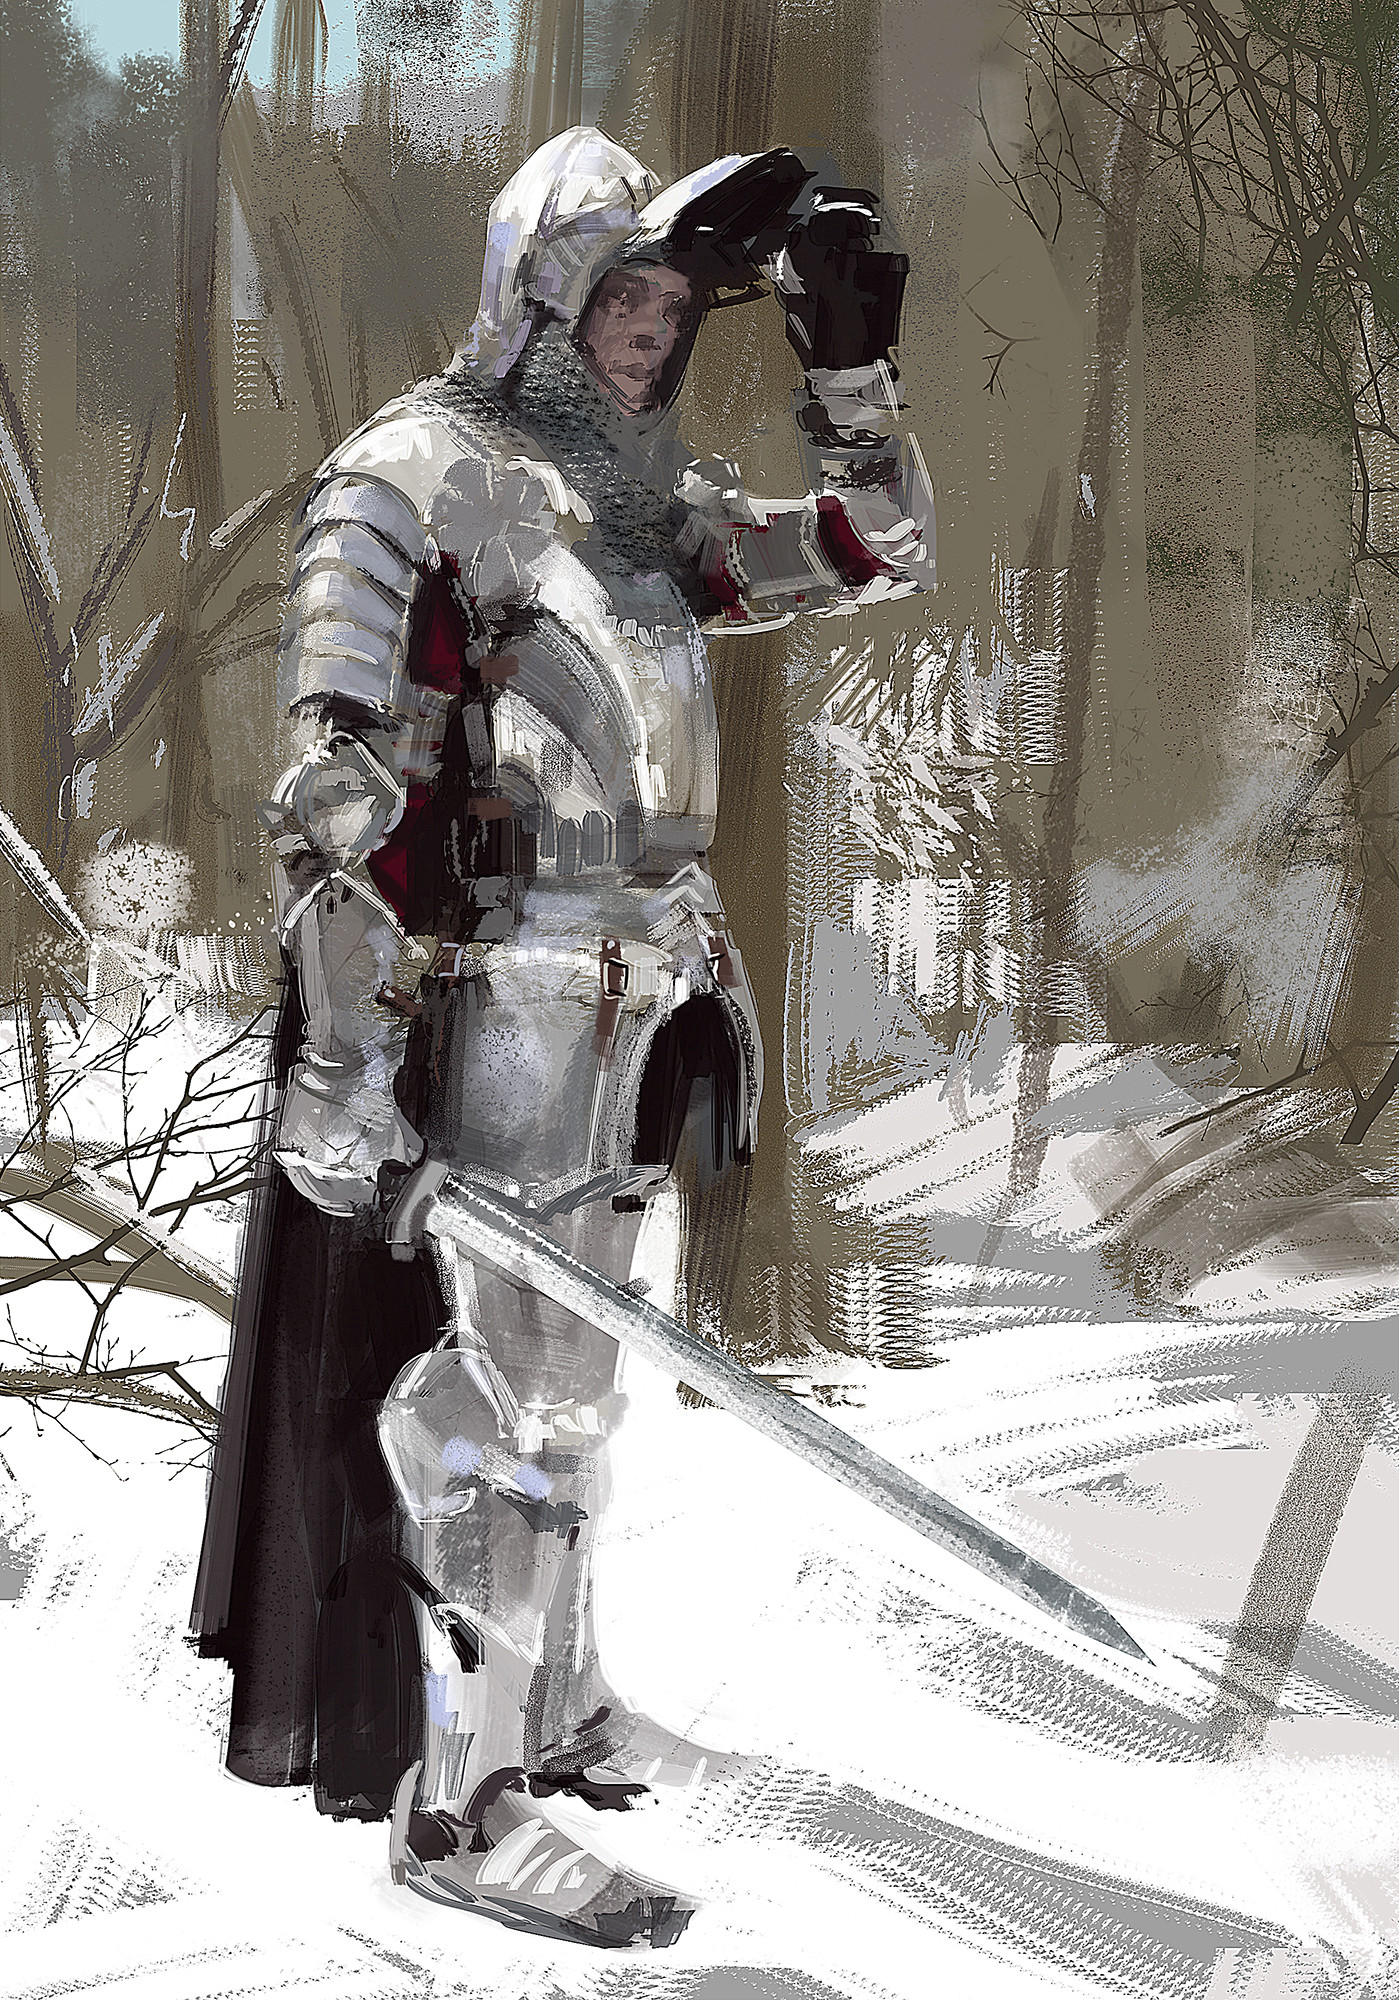 Joakim ericsson knight sk2